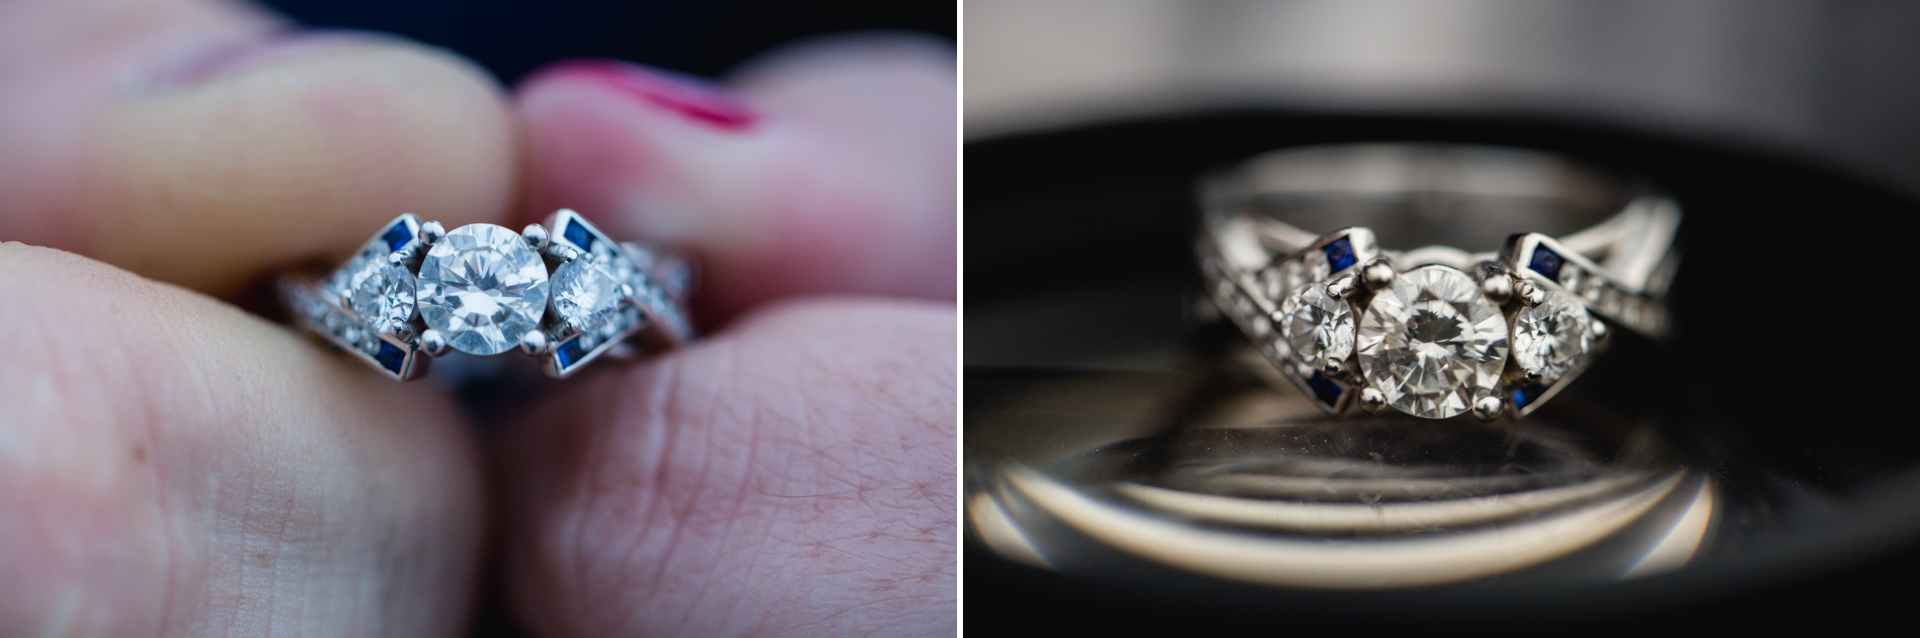 La Jolla Ring Photography